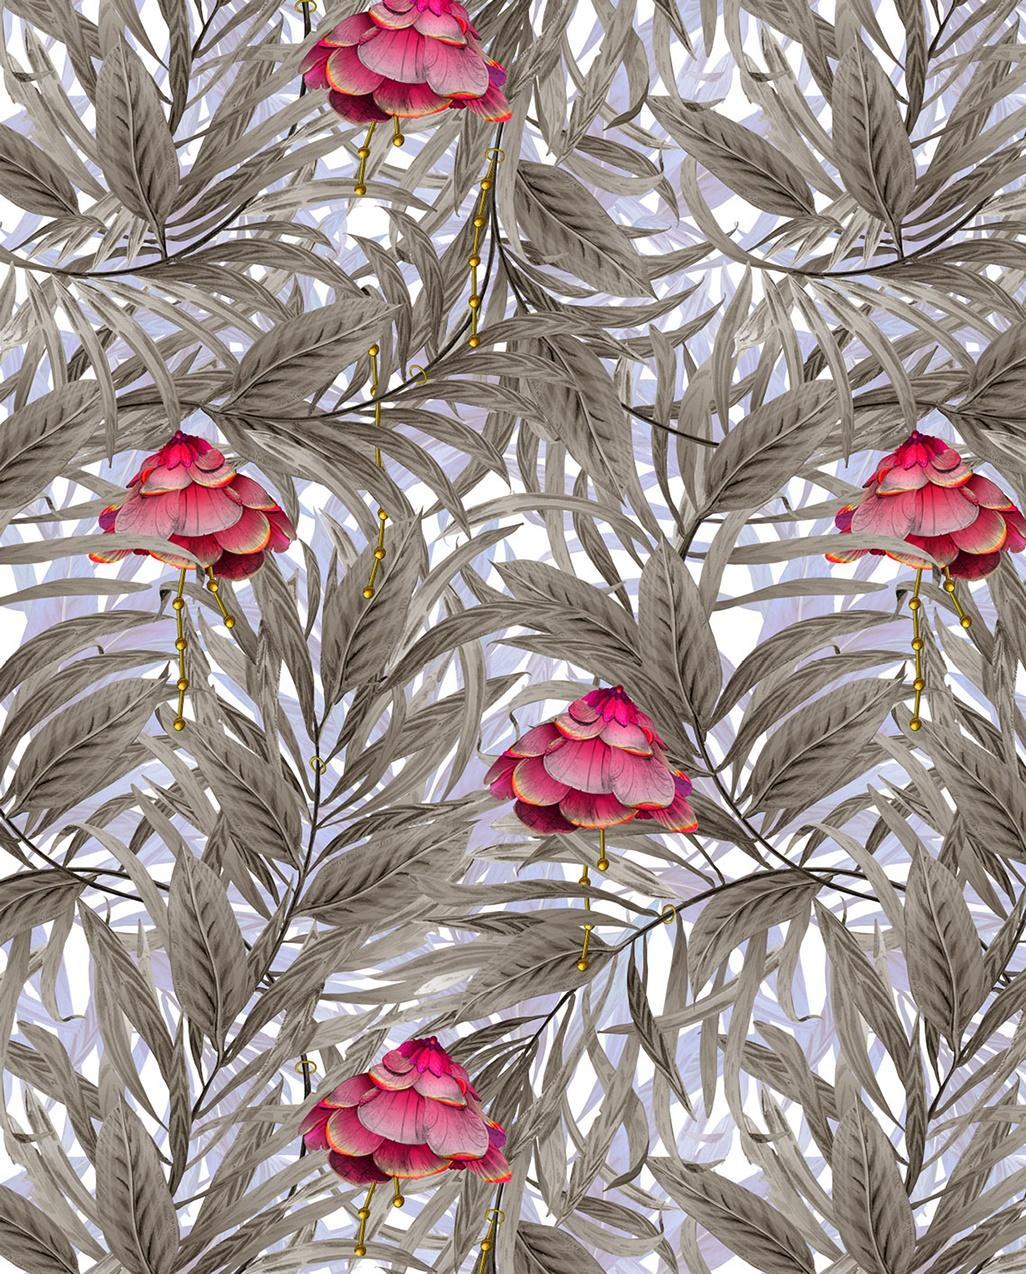 09._Pearls_in_the_Camellias_Velvet_Fabric